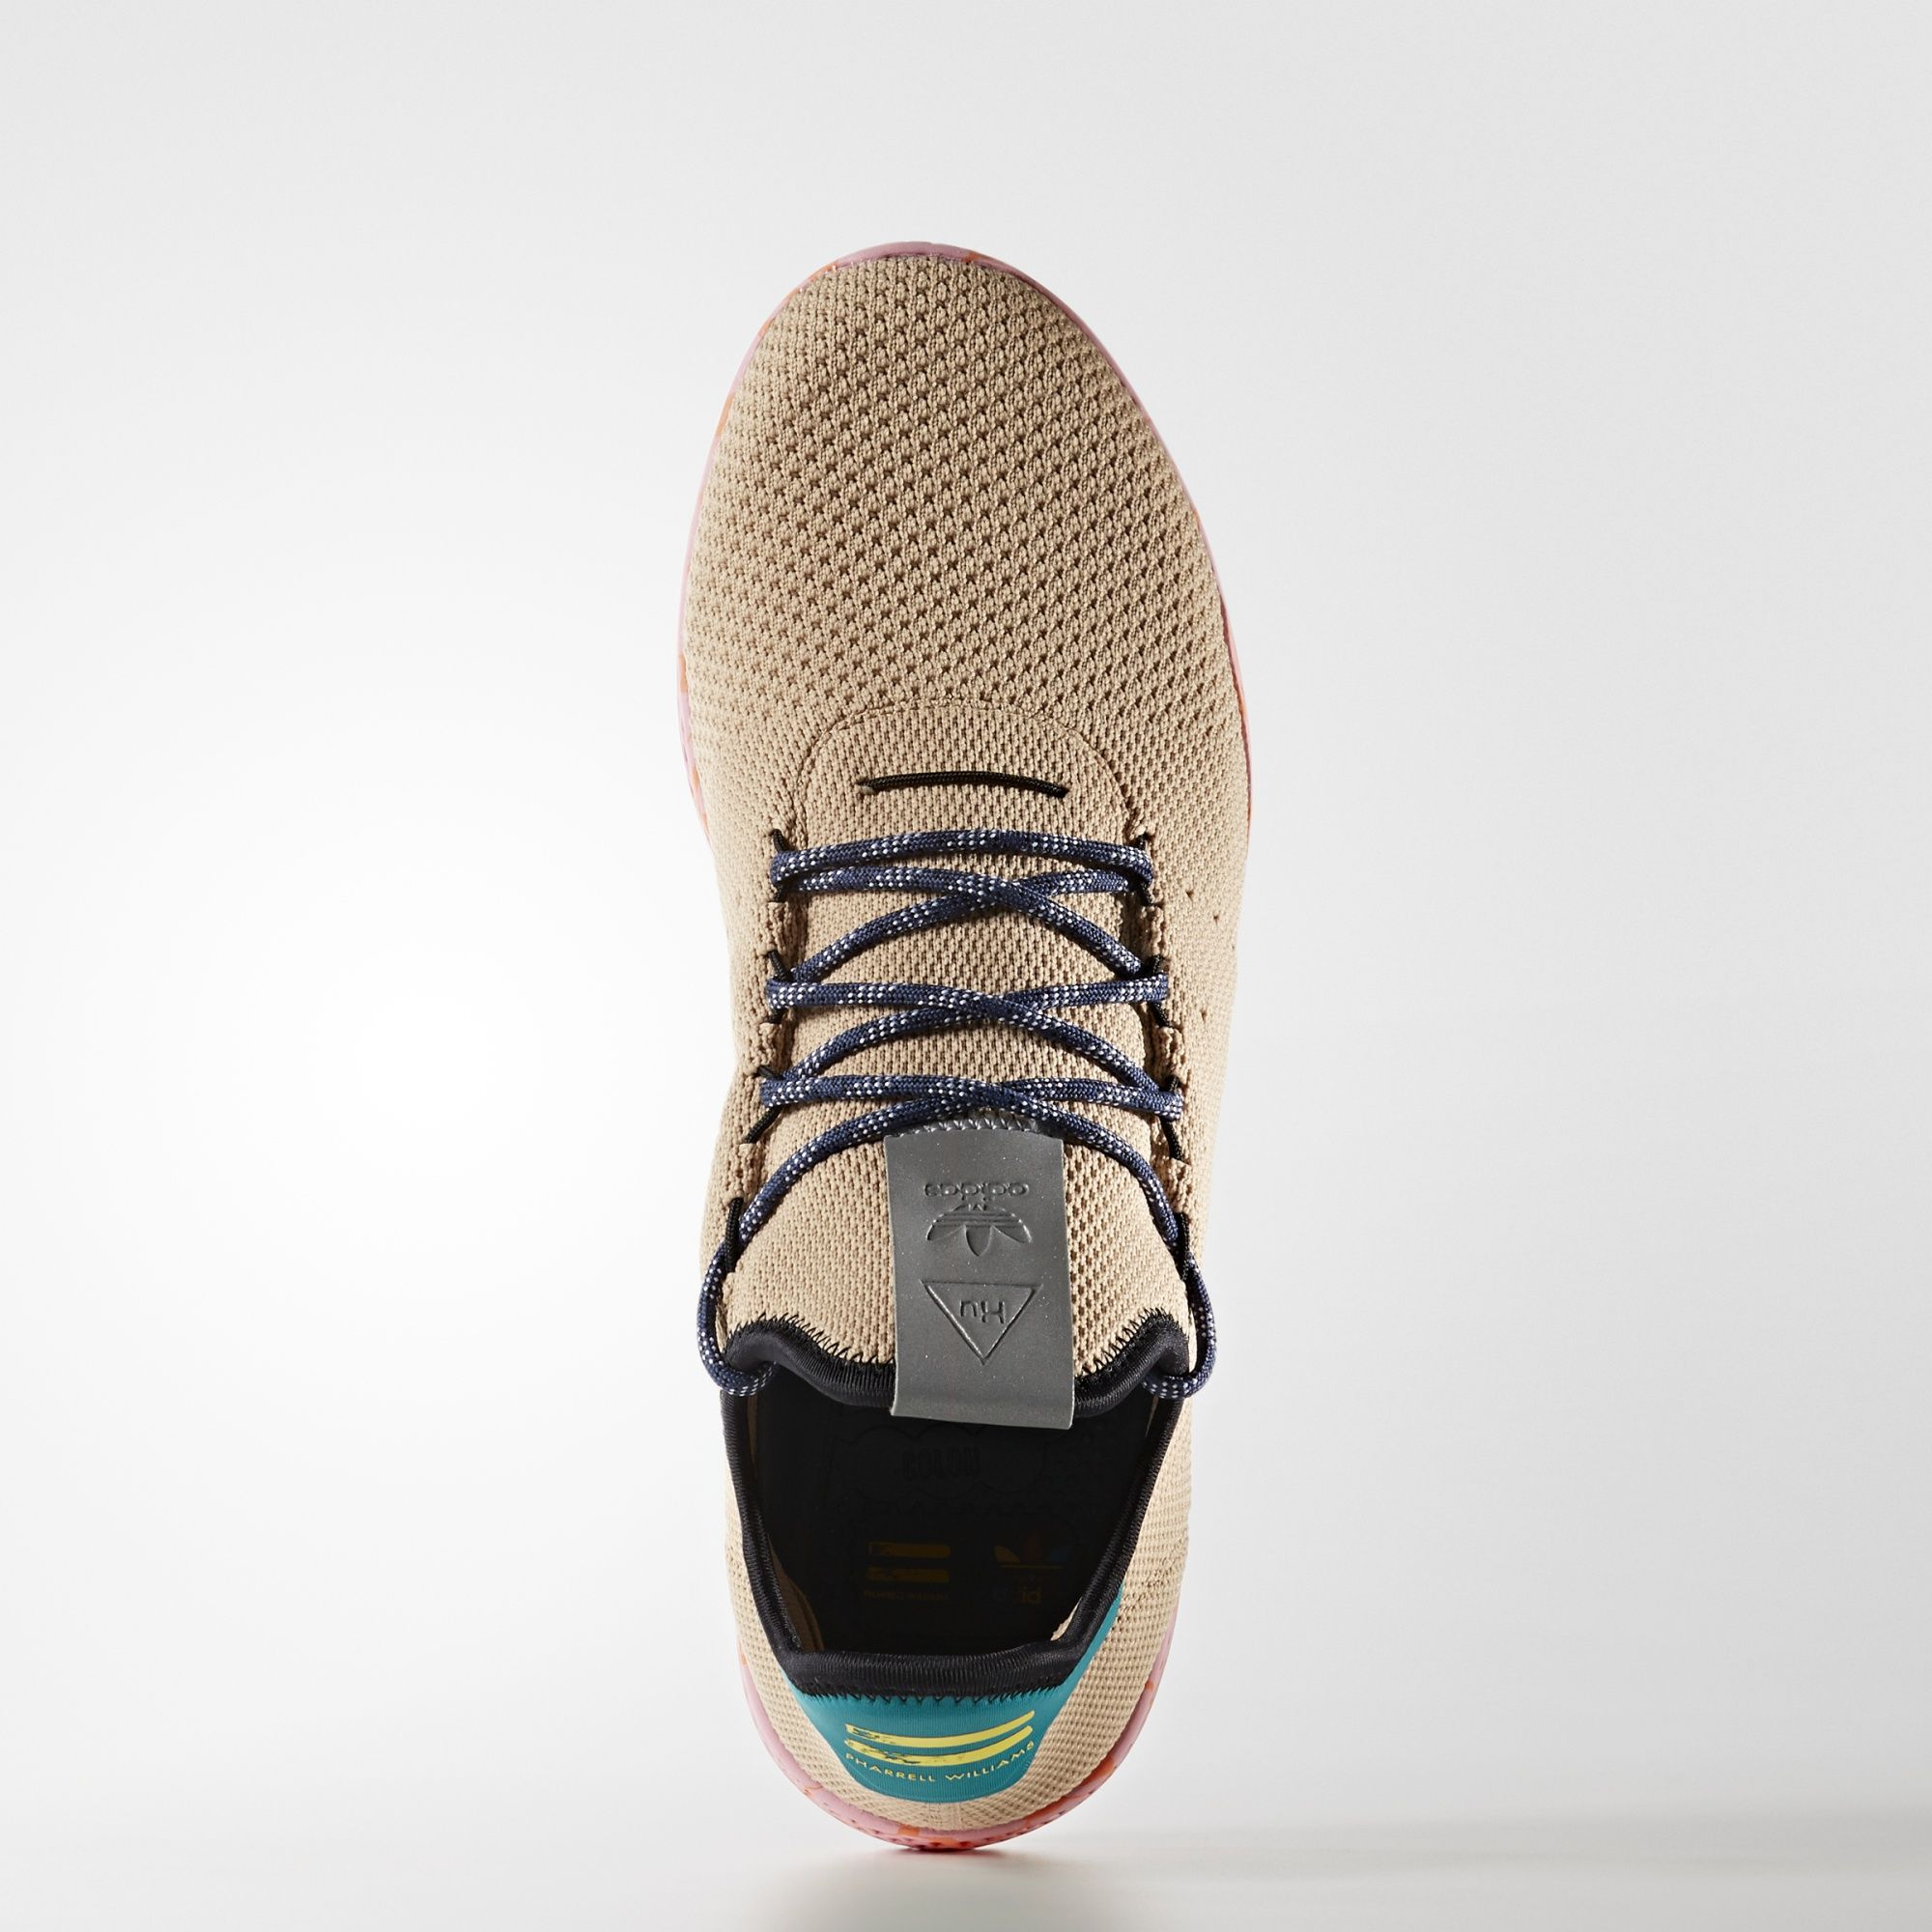 BY2672 Pharrell Williams x adidas Tennis HU Nomad Yellow 1